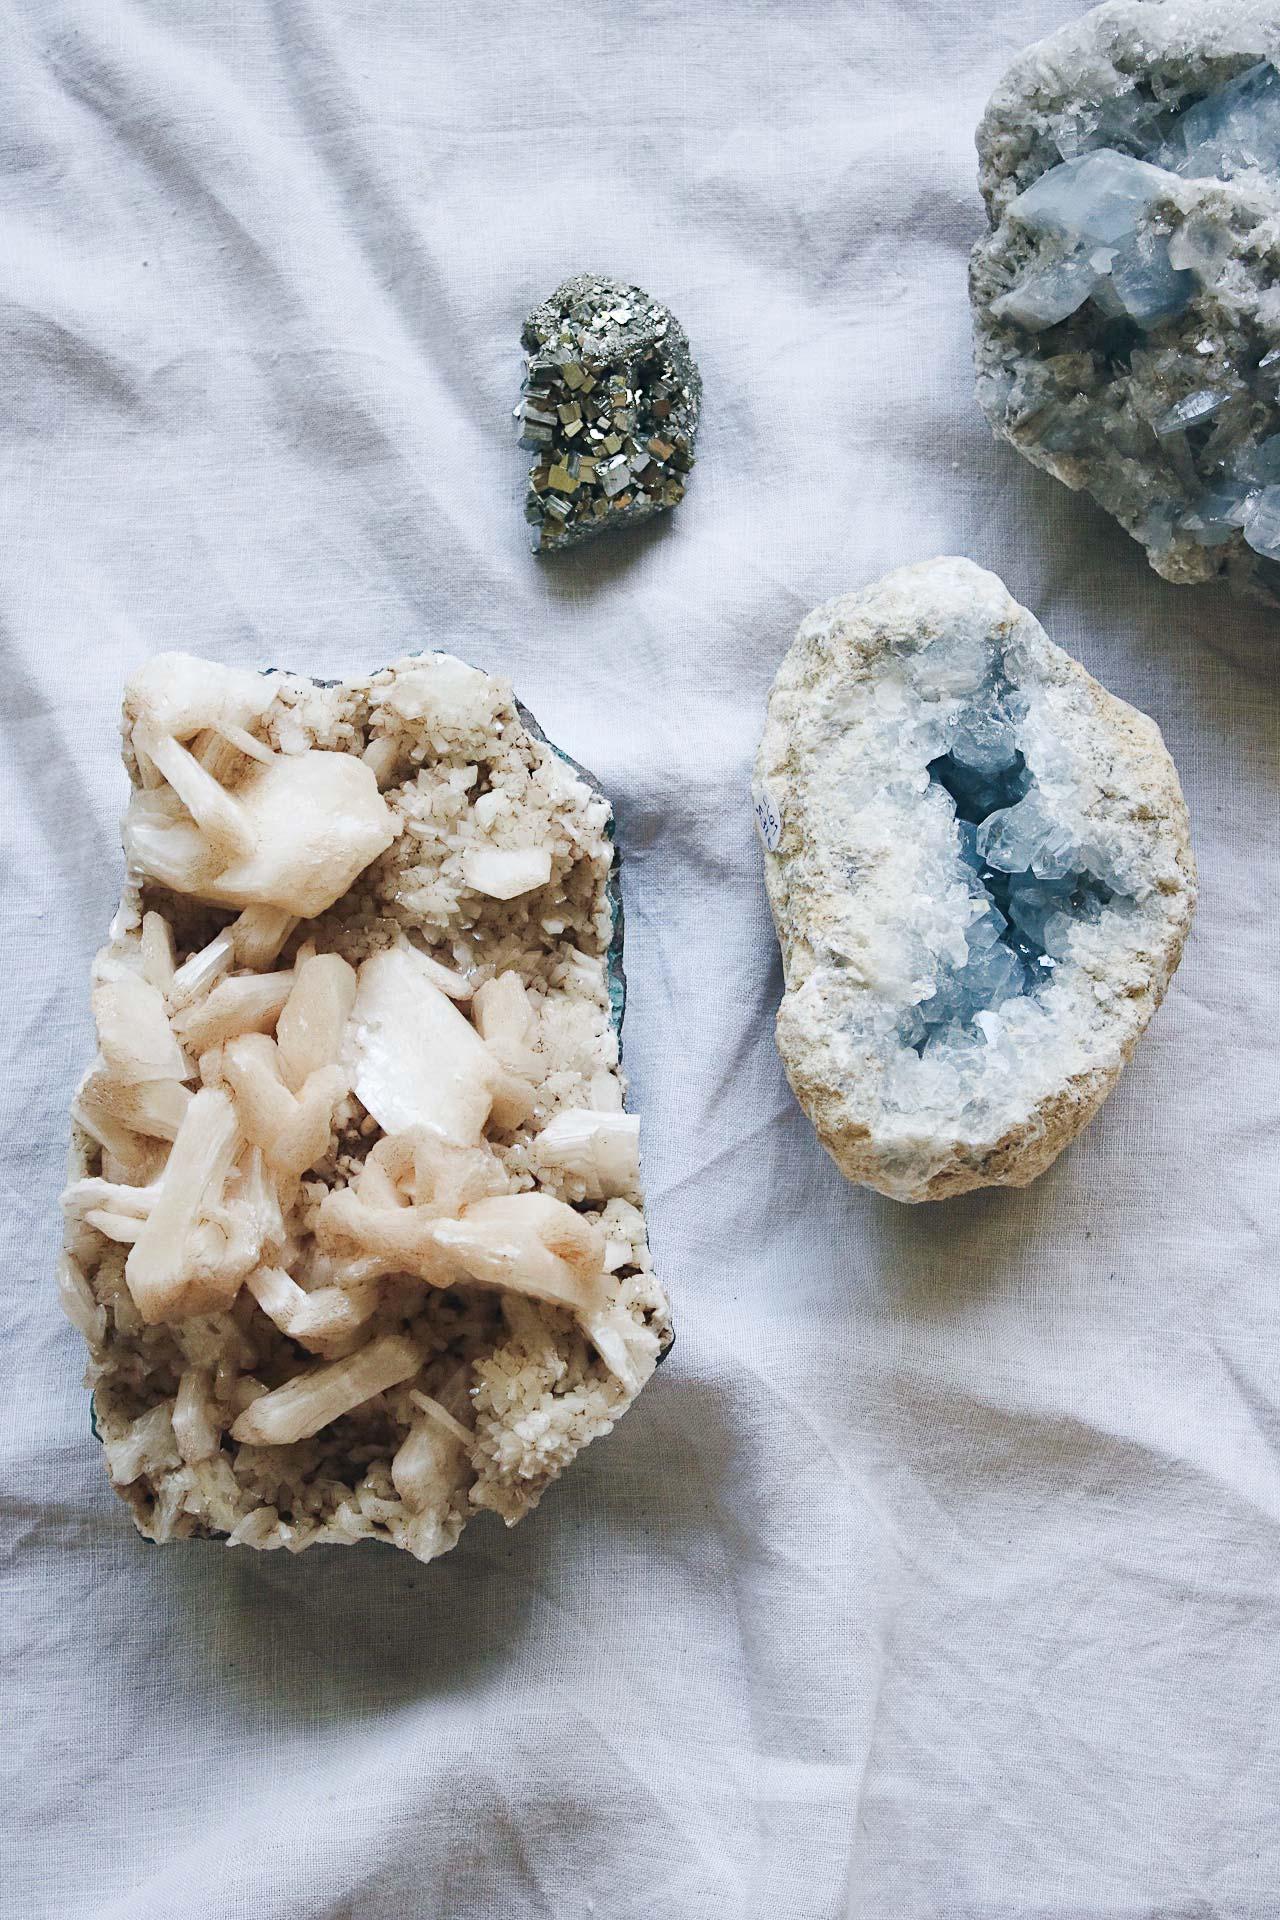 Minerales Celestina Drusa Geoda Pirita Heulandita Selected Crystals